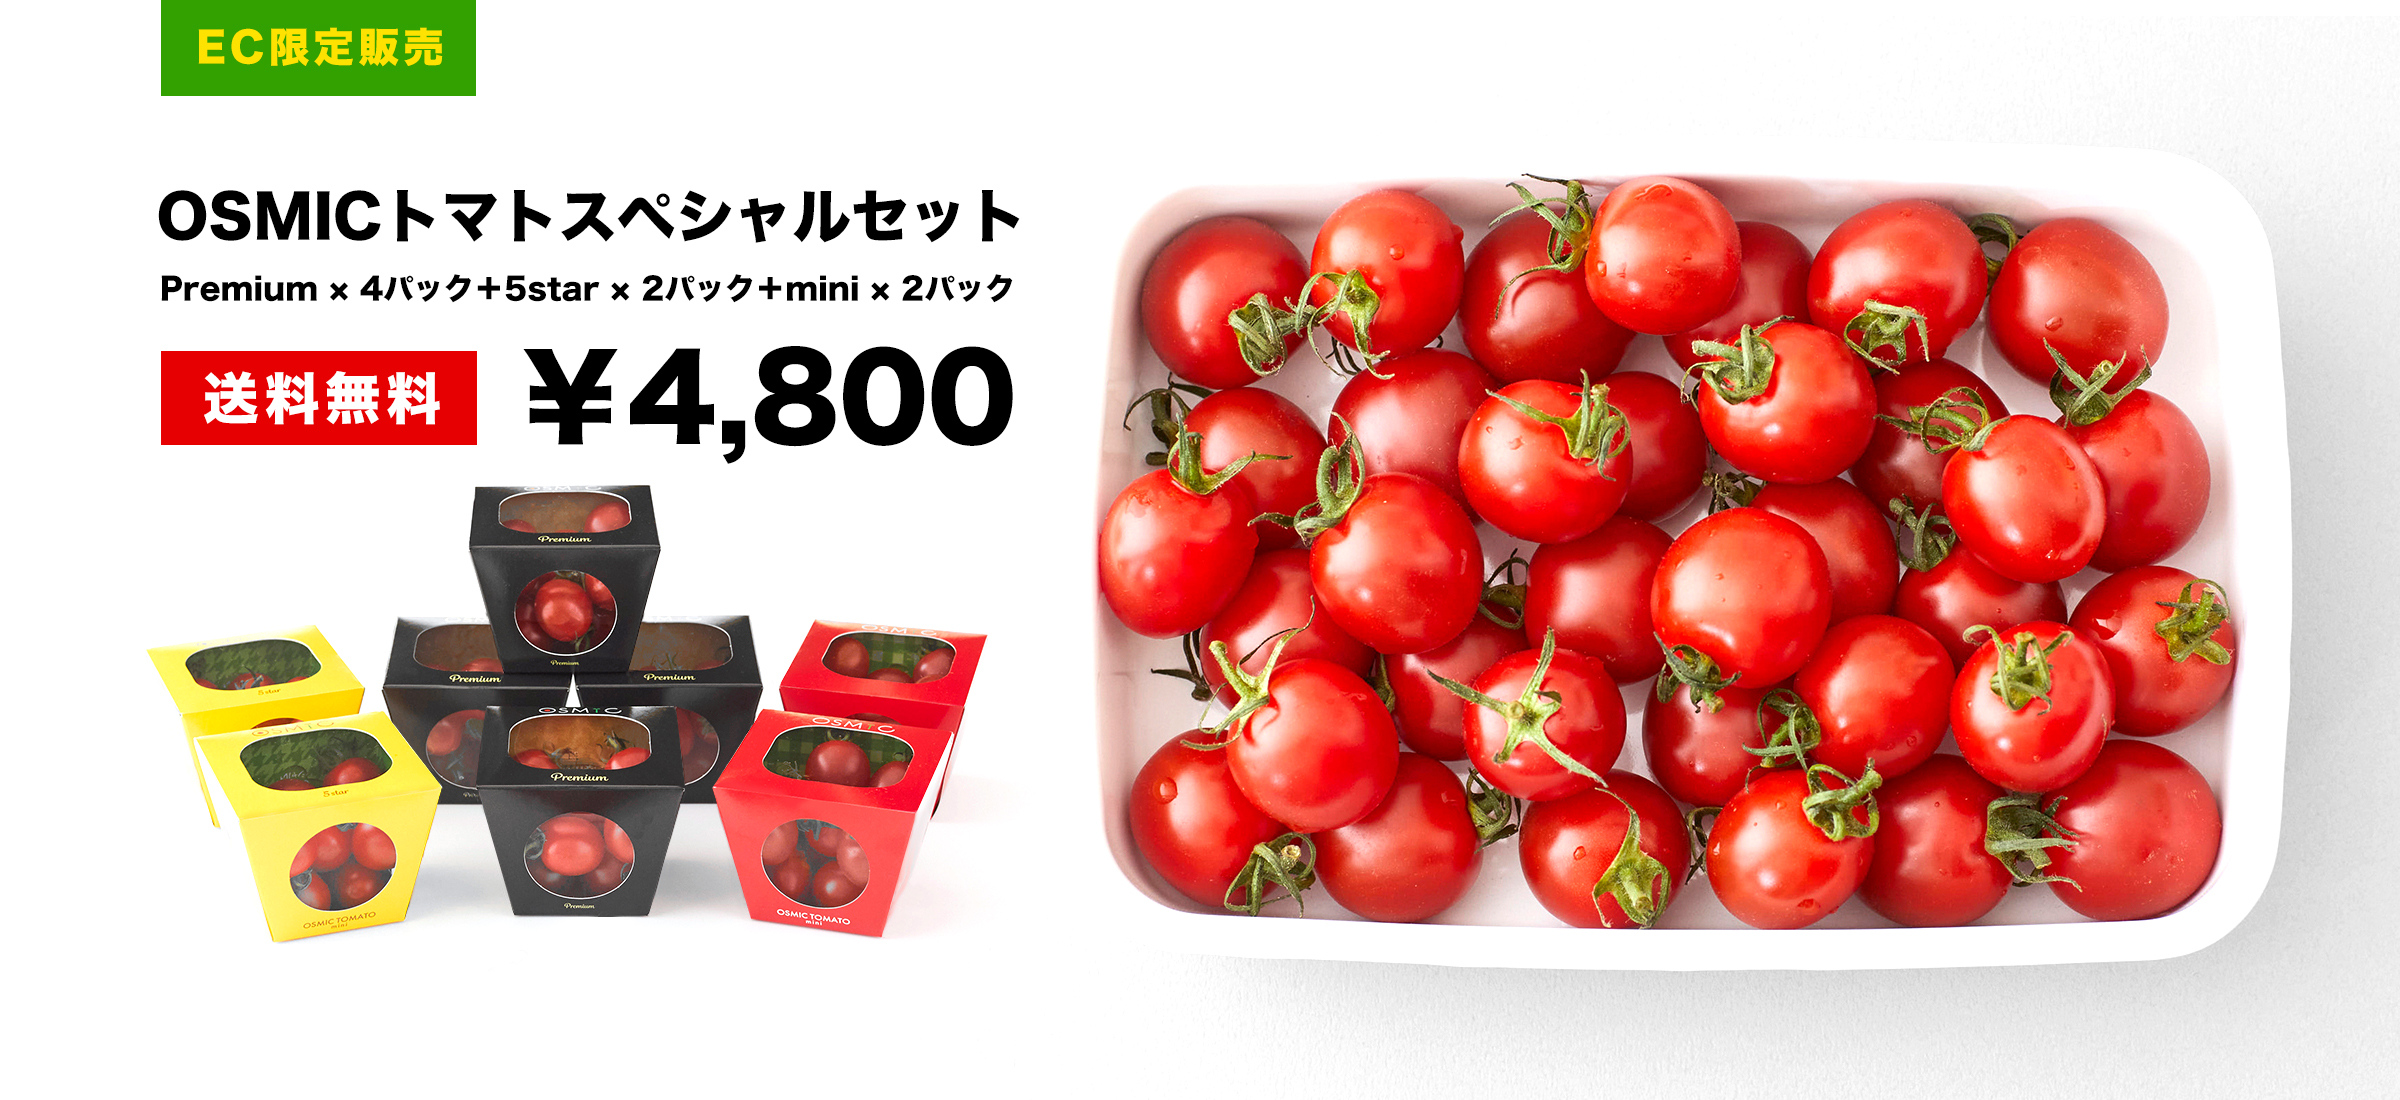 OSMICトマトEC限定スペシャルセット